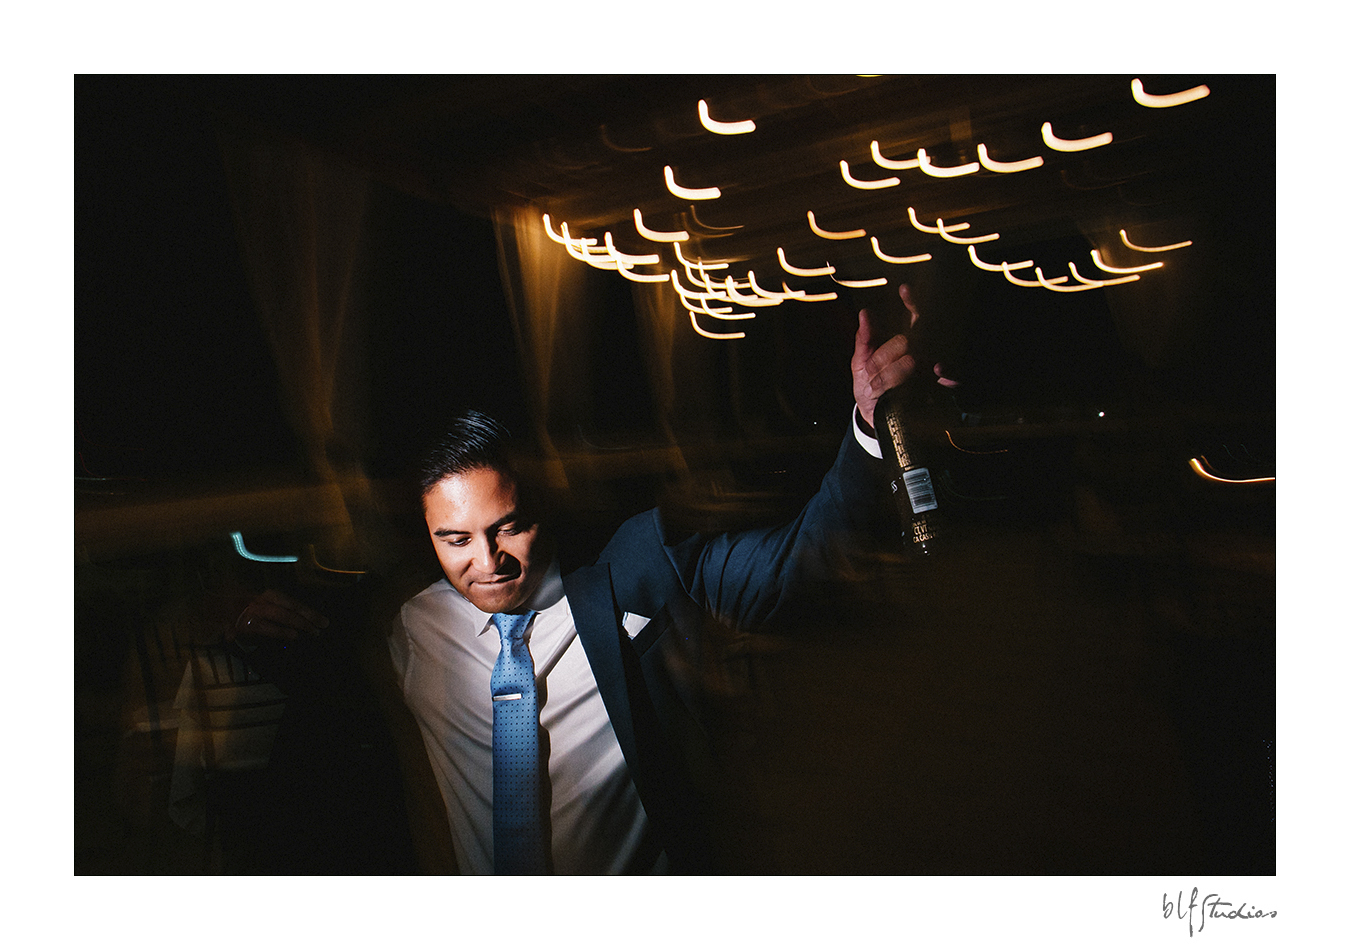 0051-blfstudios-wedding-photographer-daniel-danielle-atlanta.jpg